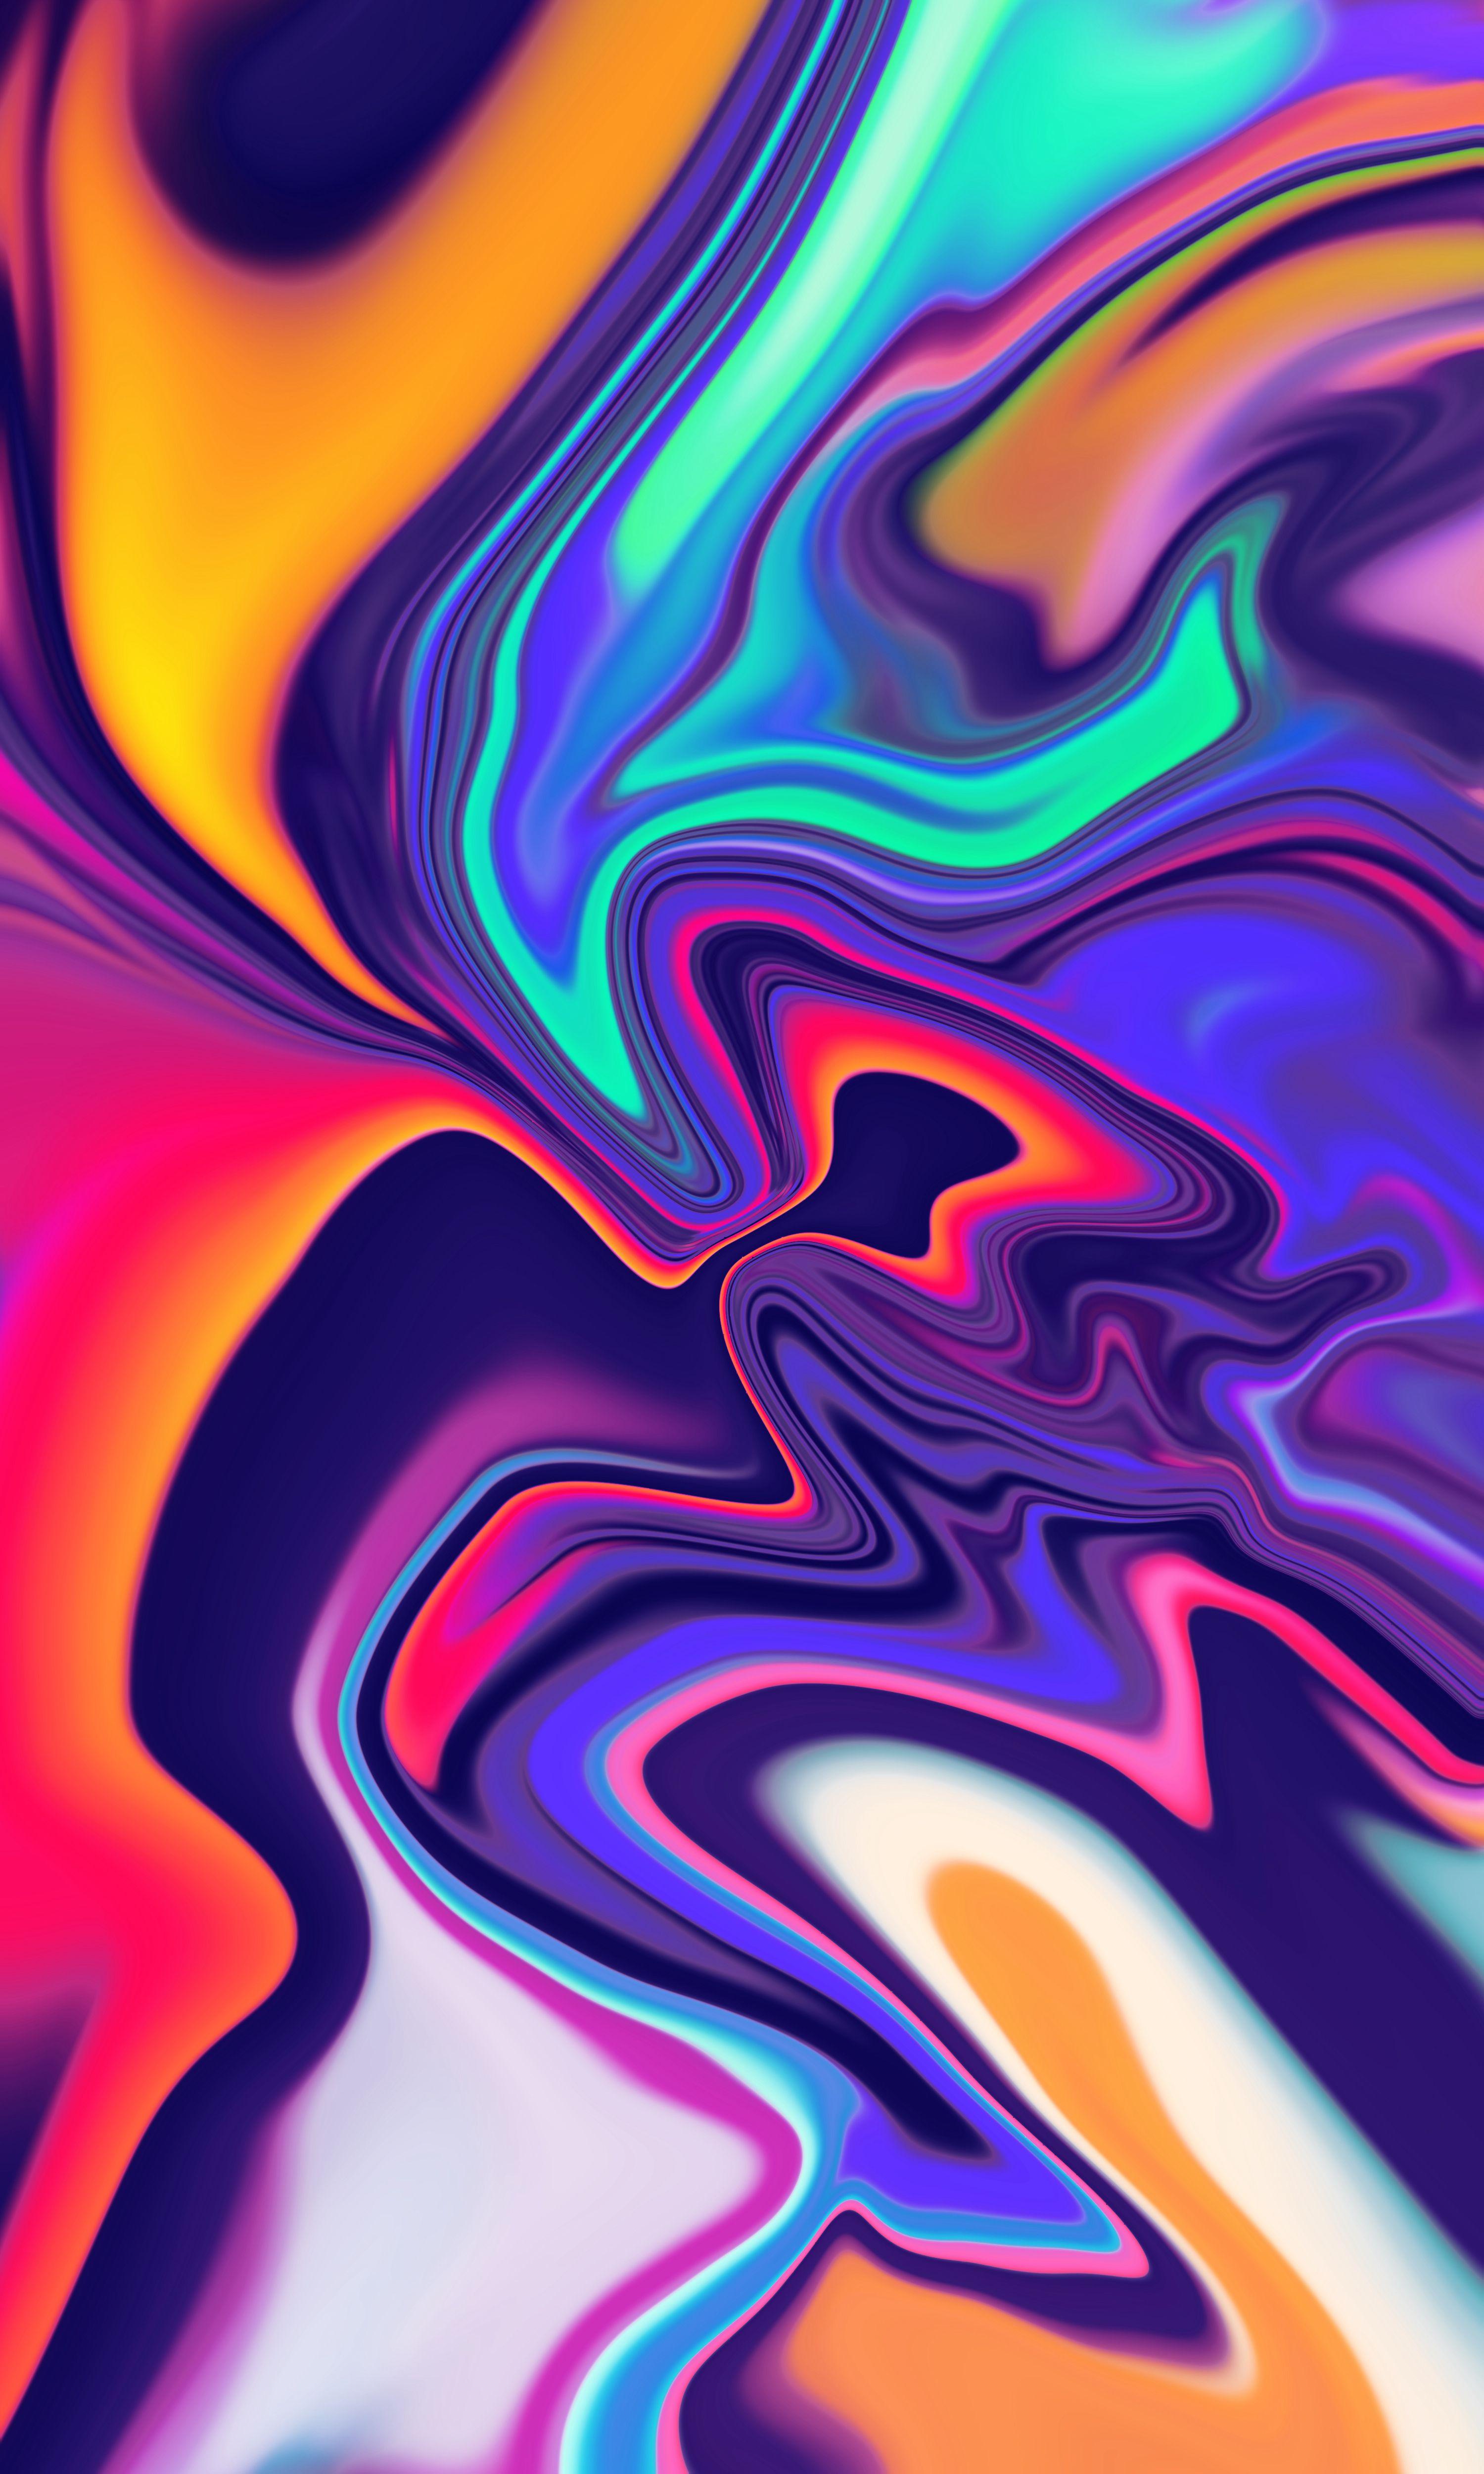 Best Wallpaper For Iphone 11 Pro Max Ytechb Com Abstract Iphone Wallpaper Abstract Art Wallpaper Graphic Wallpaper